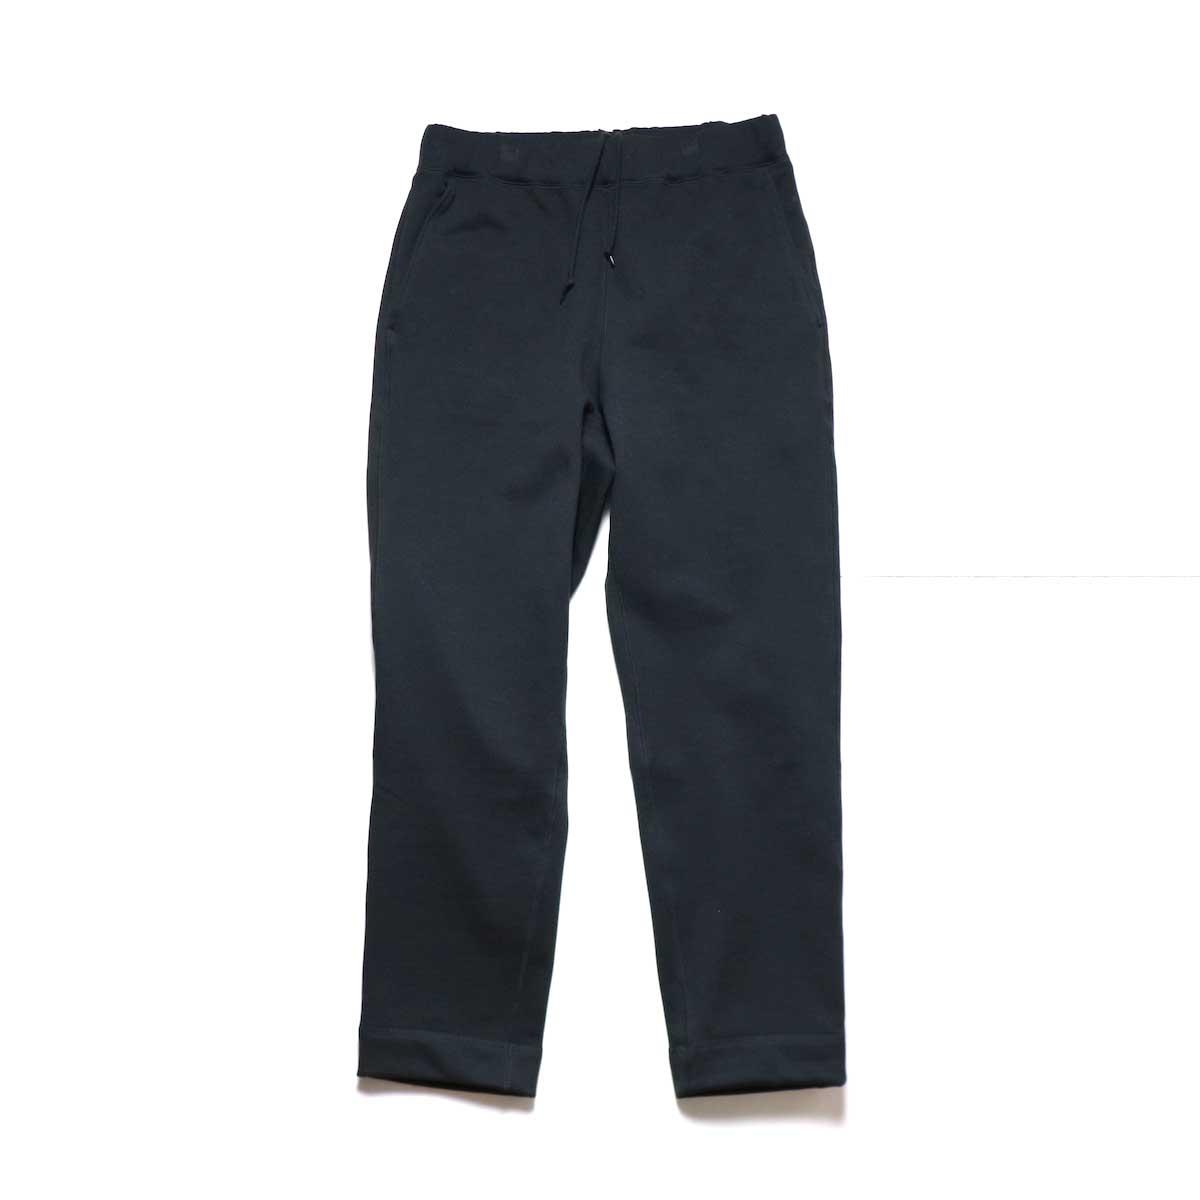 N.HOOLYWOOD / 27RCH-013 Track Pants (Black)